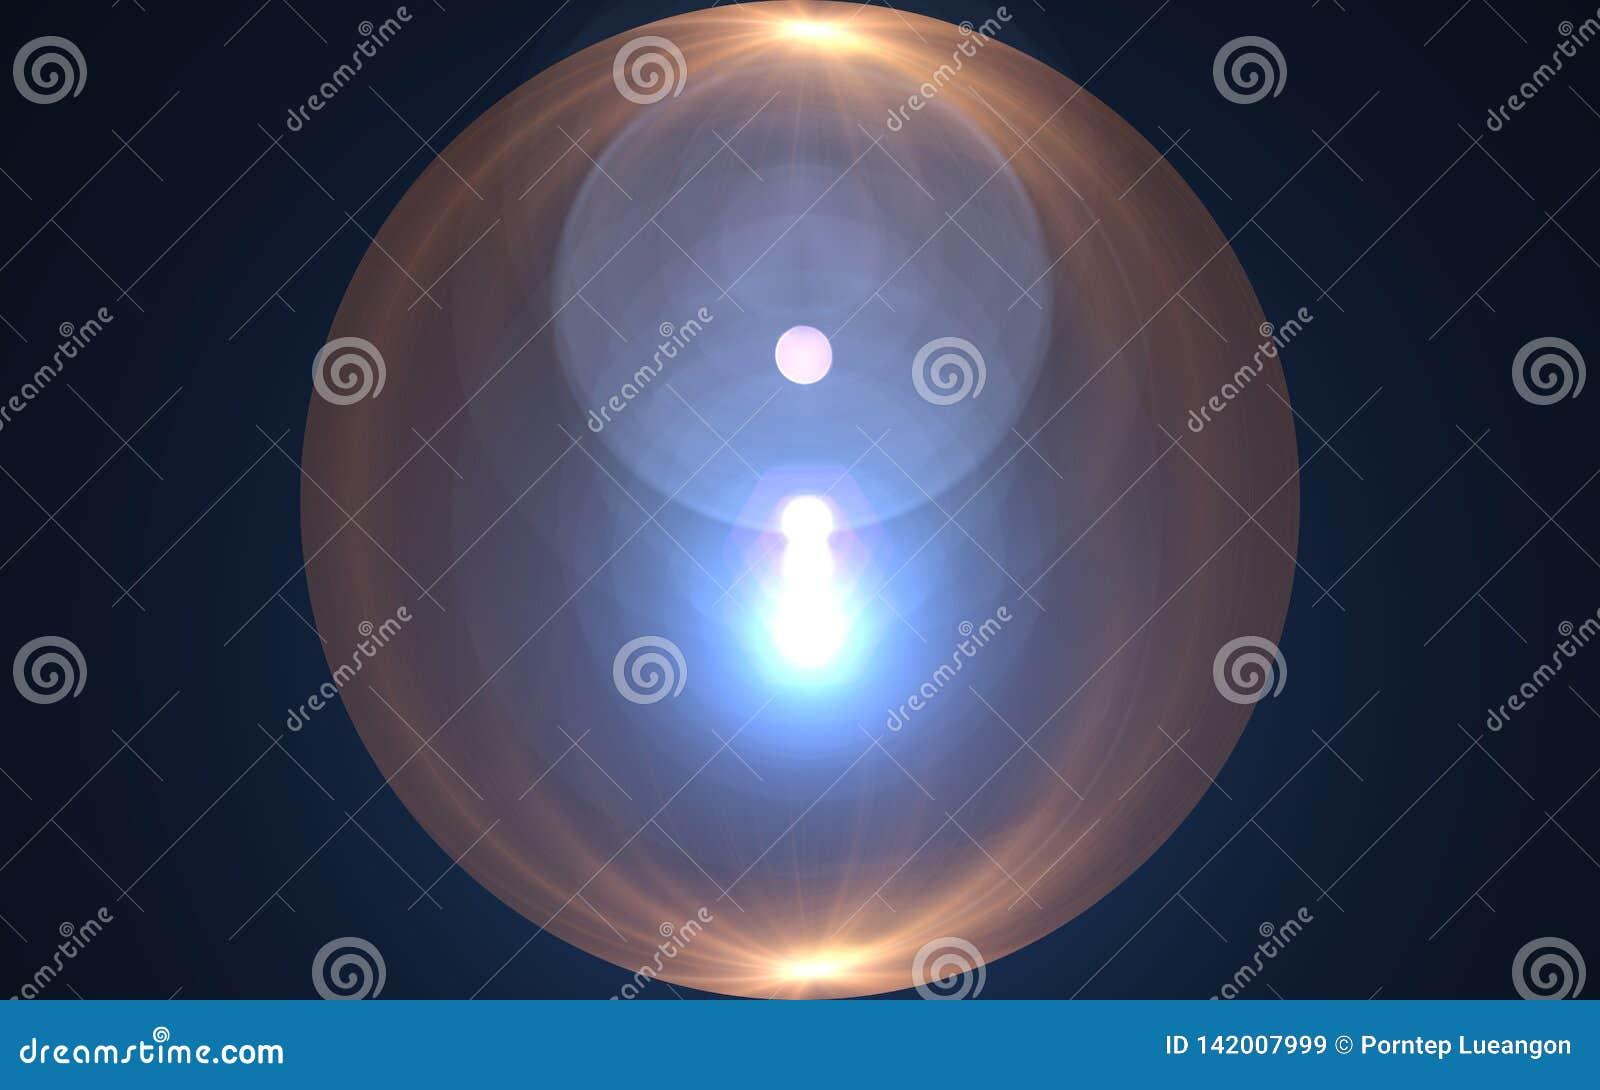 Orbljussignalljus Abstrakt solbristning med digital linssignalljusbakgrund Vit signalljuseffekt på lodlinje